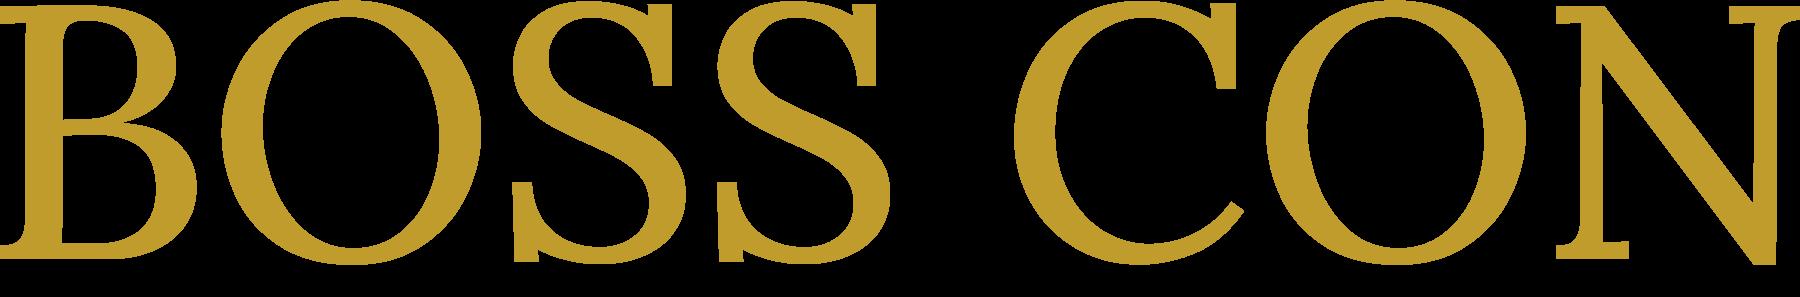 BossConLive Logo